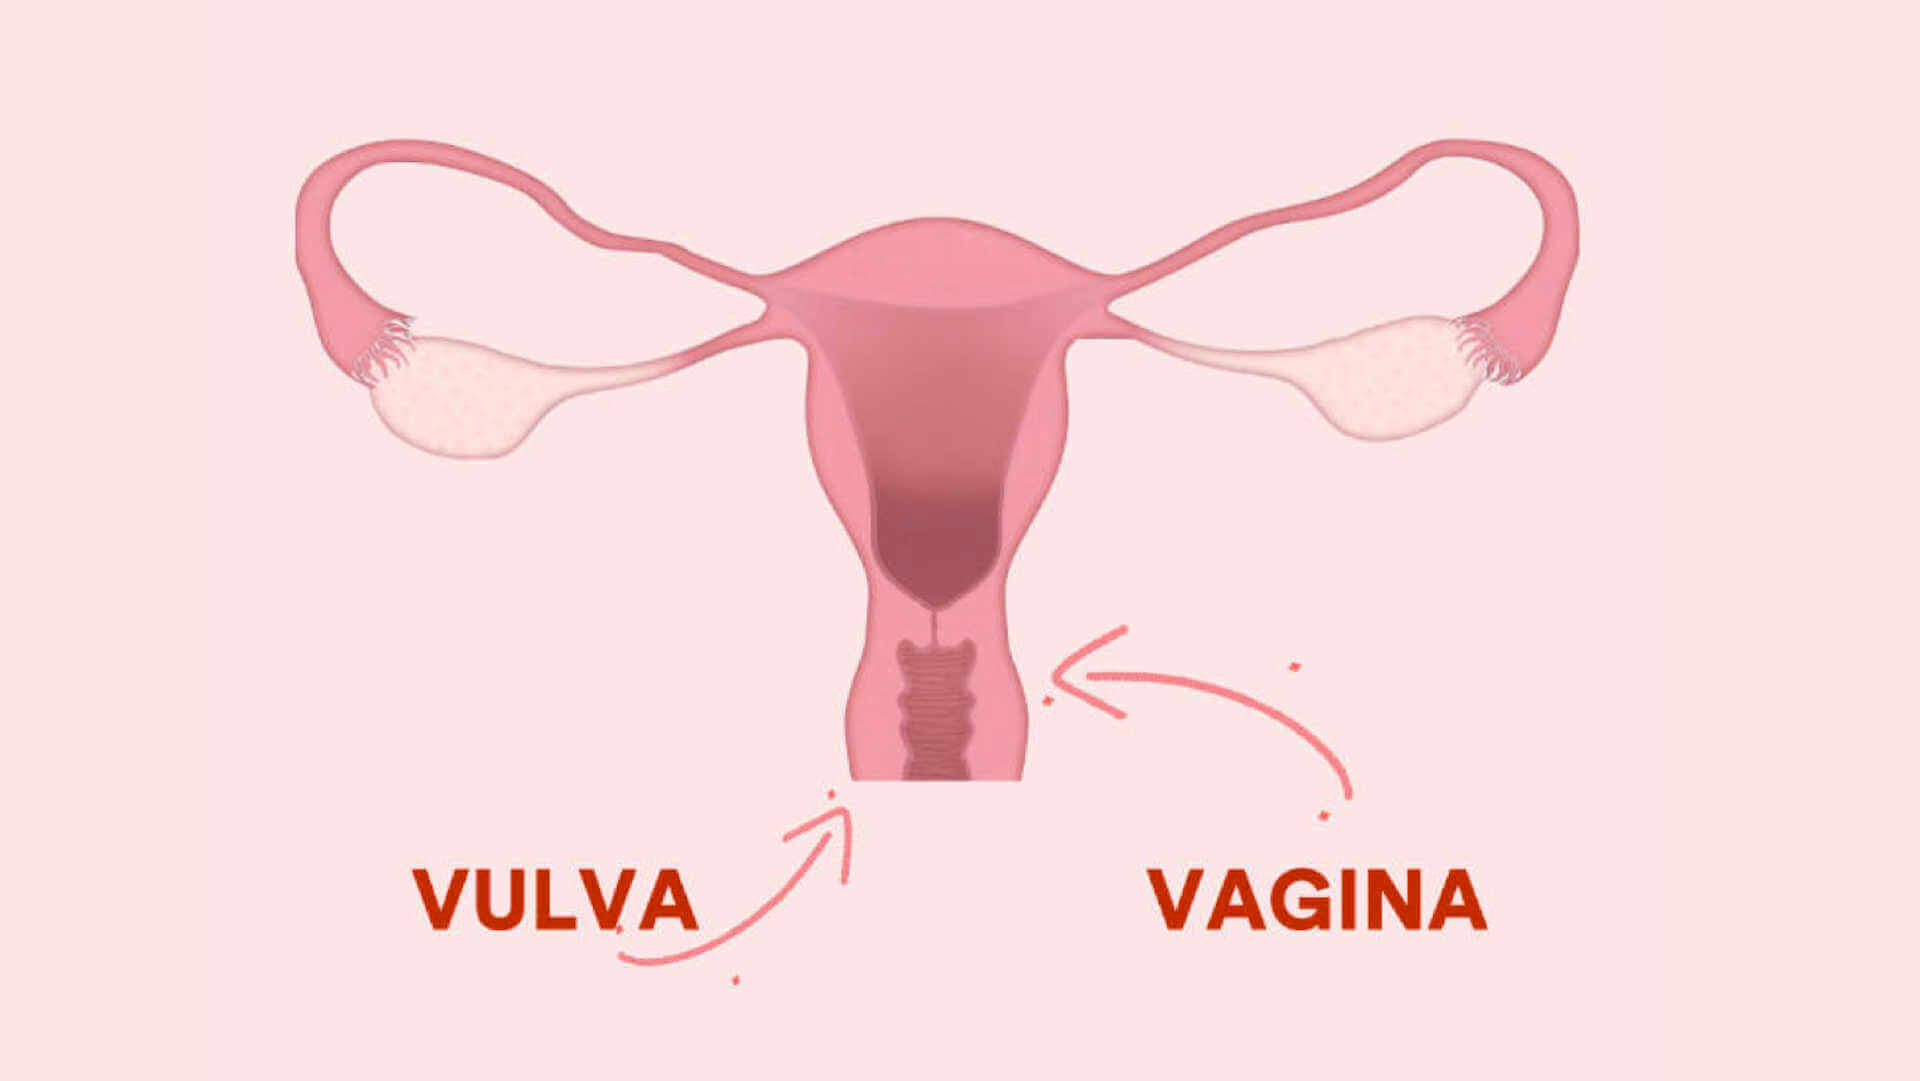 Vulva, Vagina, Unterschied